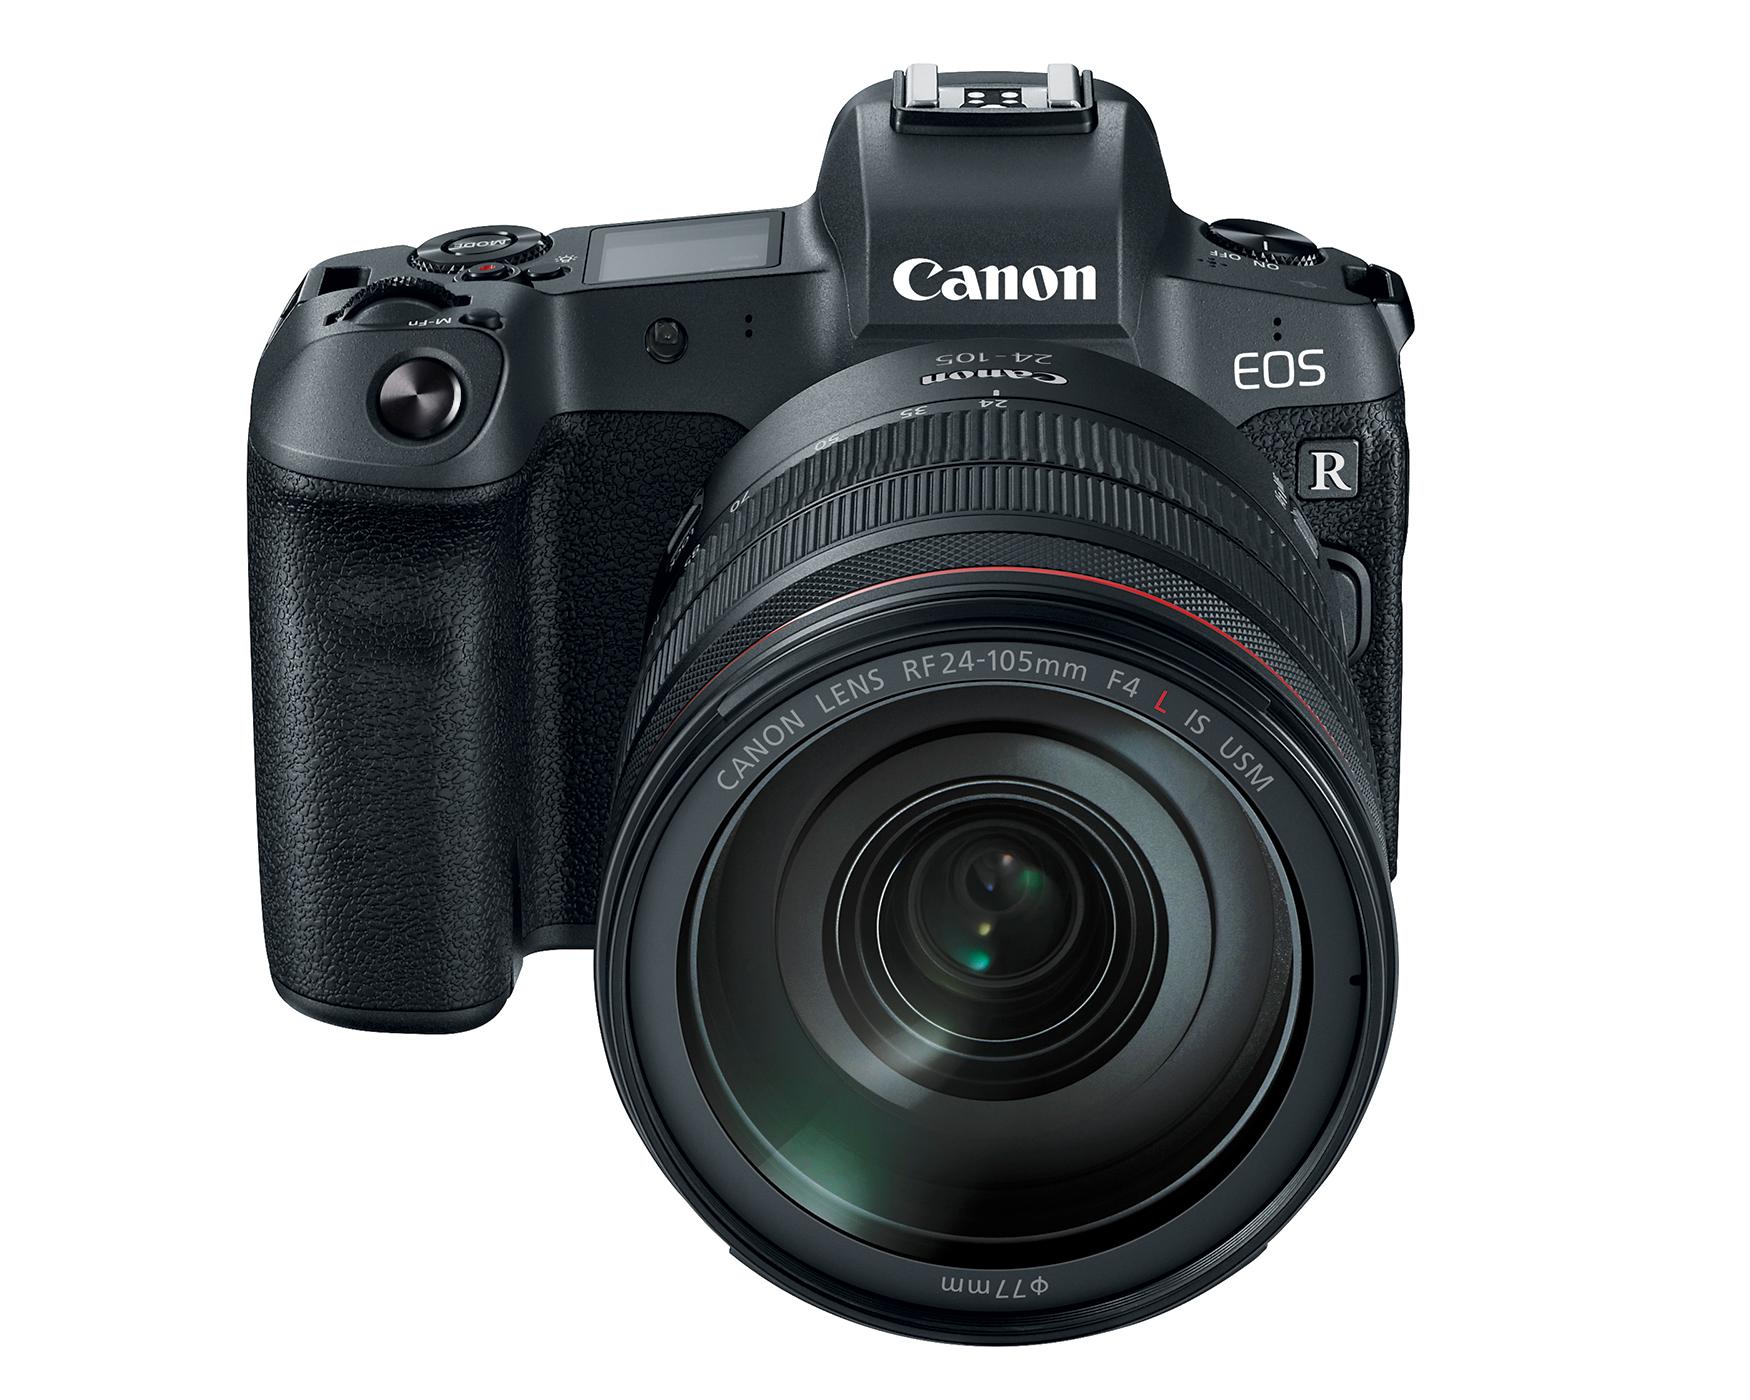 Arresting Canon Announces Mirrorless Canon Eos R Is Here Canon Announces Mirrorless Canon Eos R Canon Full Frame Pancake Lens Canon Full Frame 4k dpreview Canon Full Frame